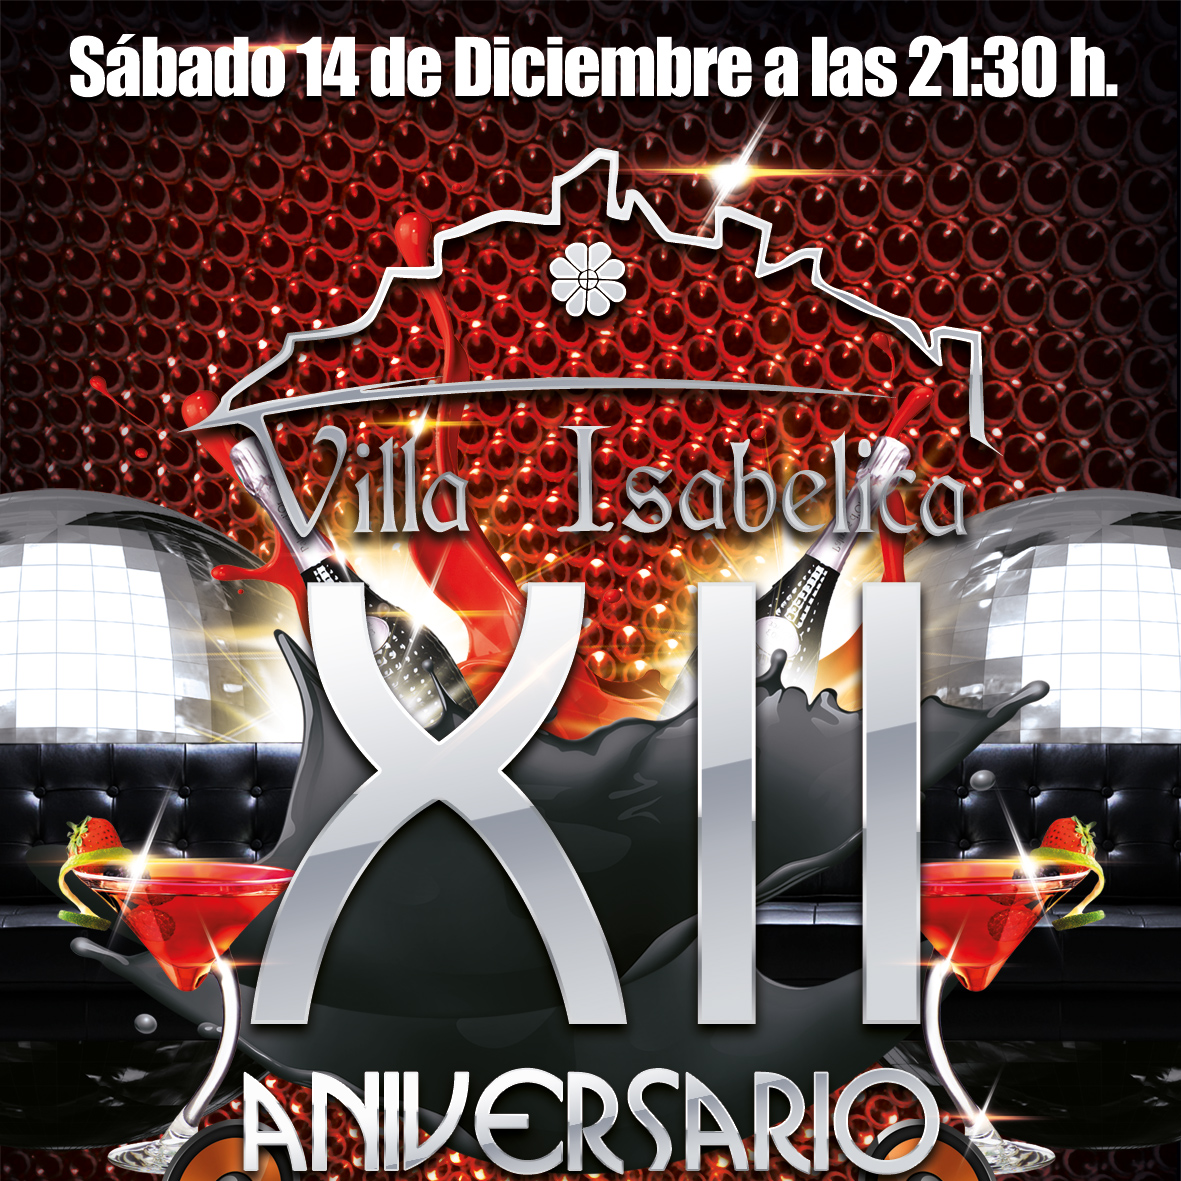 Fiesta XII Aniversario + Autobus